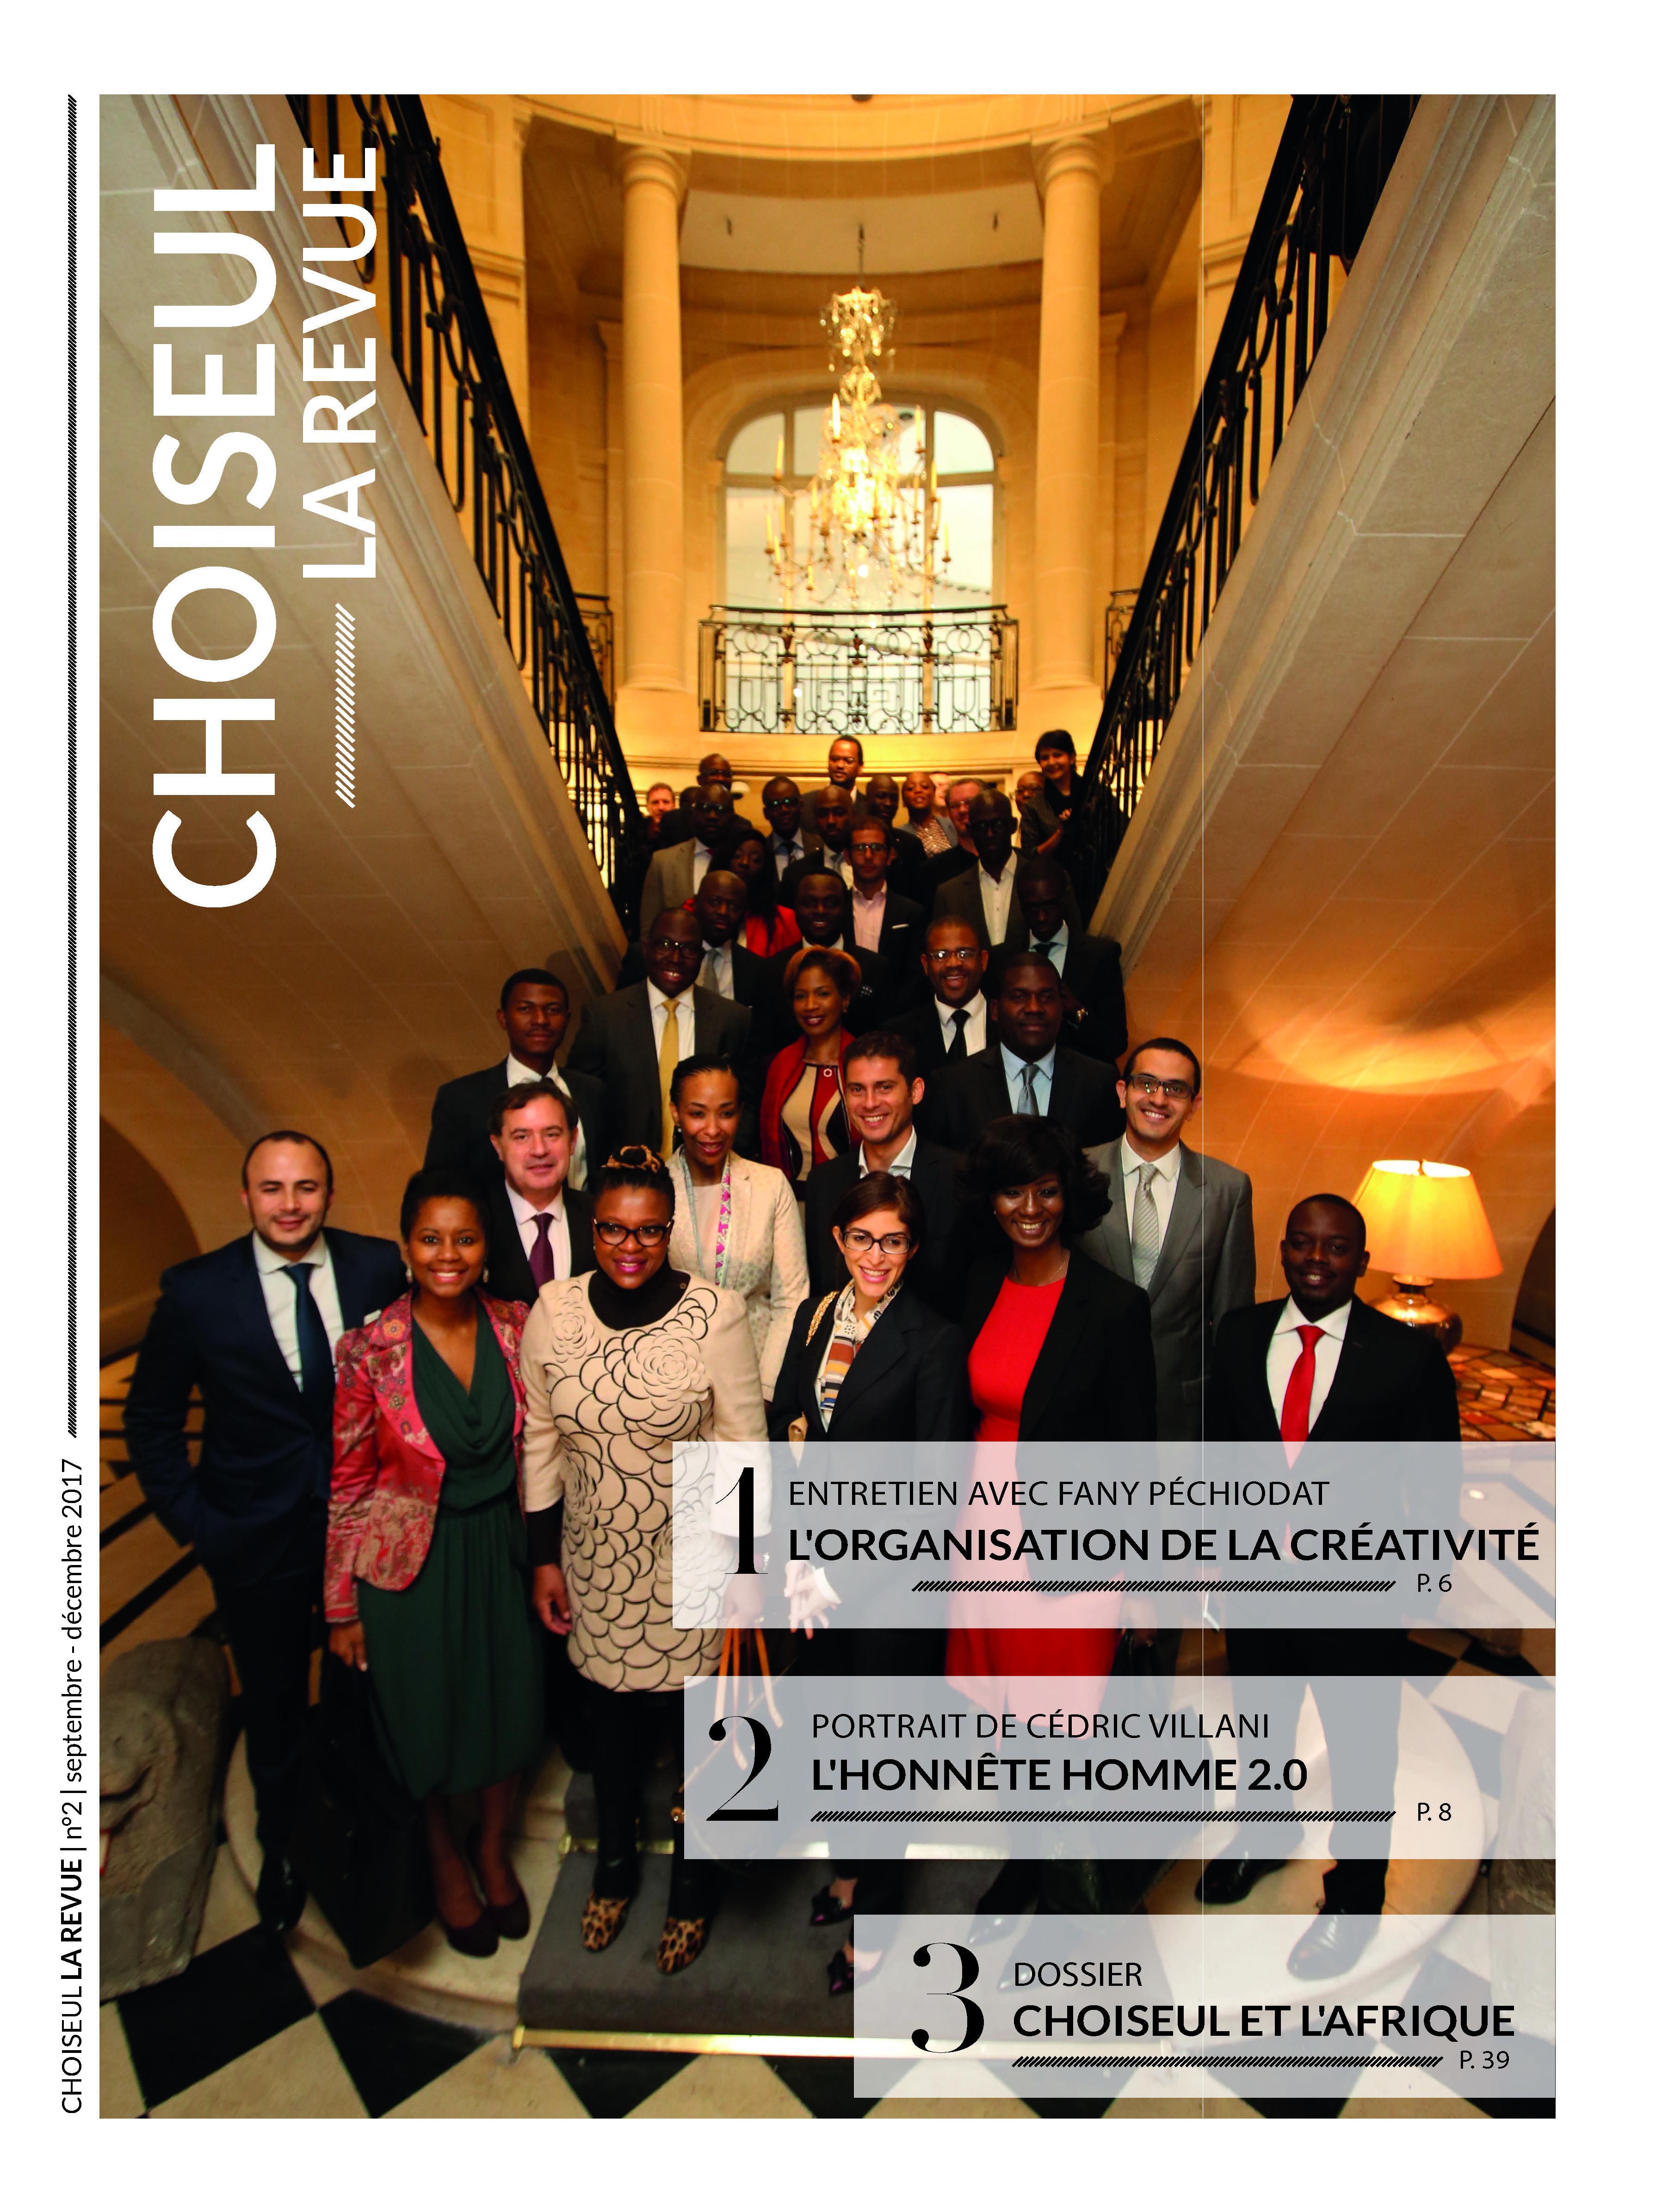 Choiseul Magazine n°2